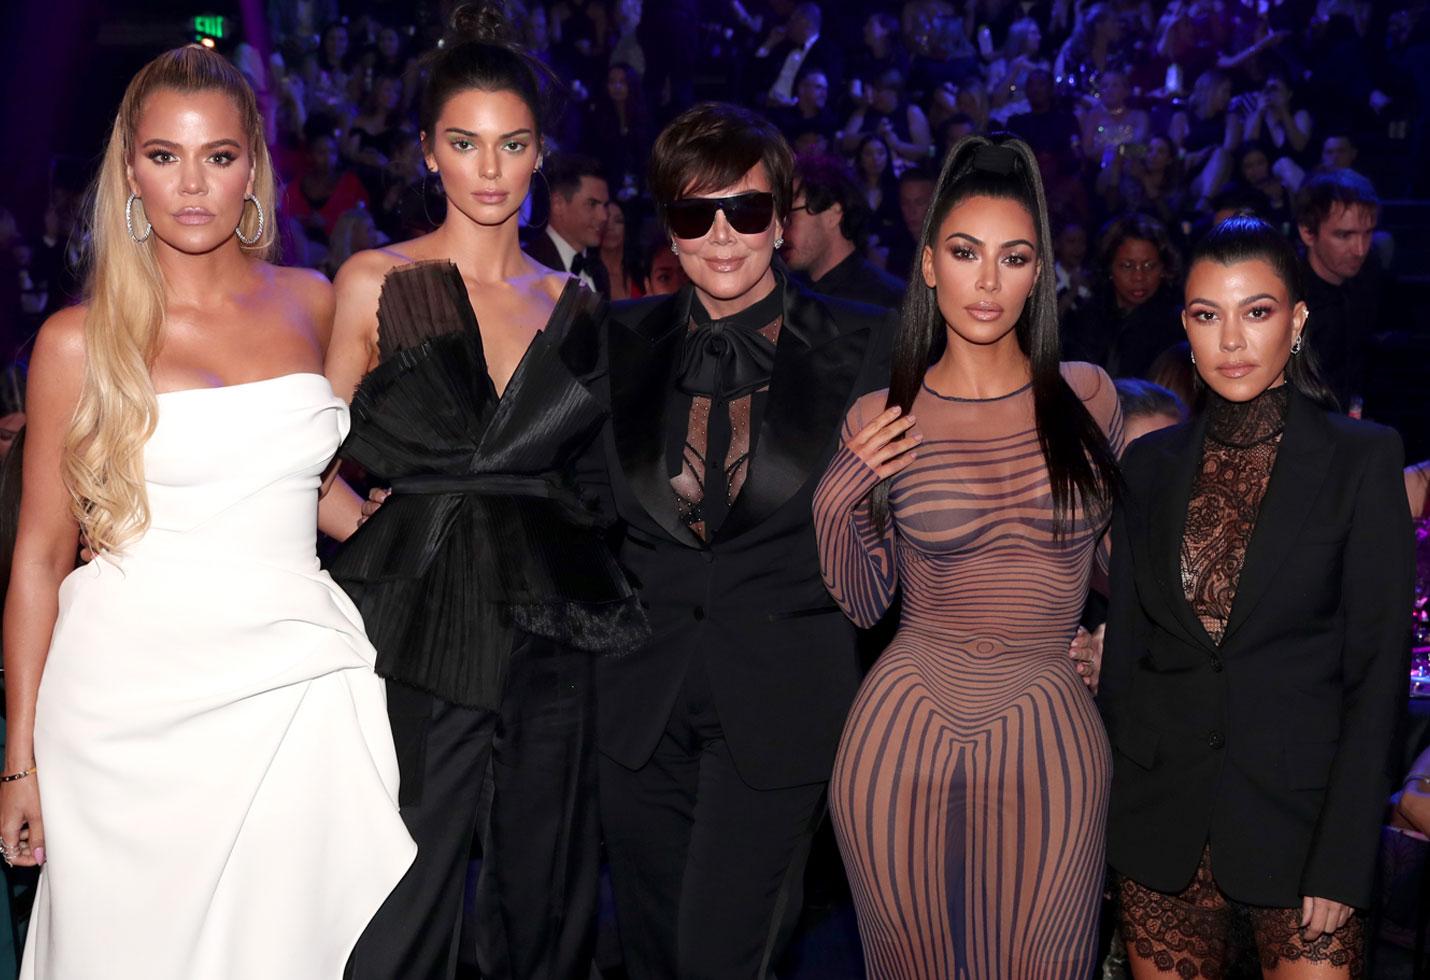 Kardashians jenners presents 2018